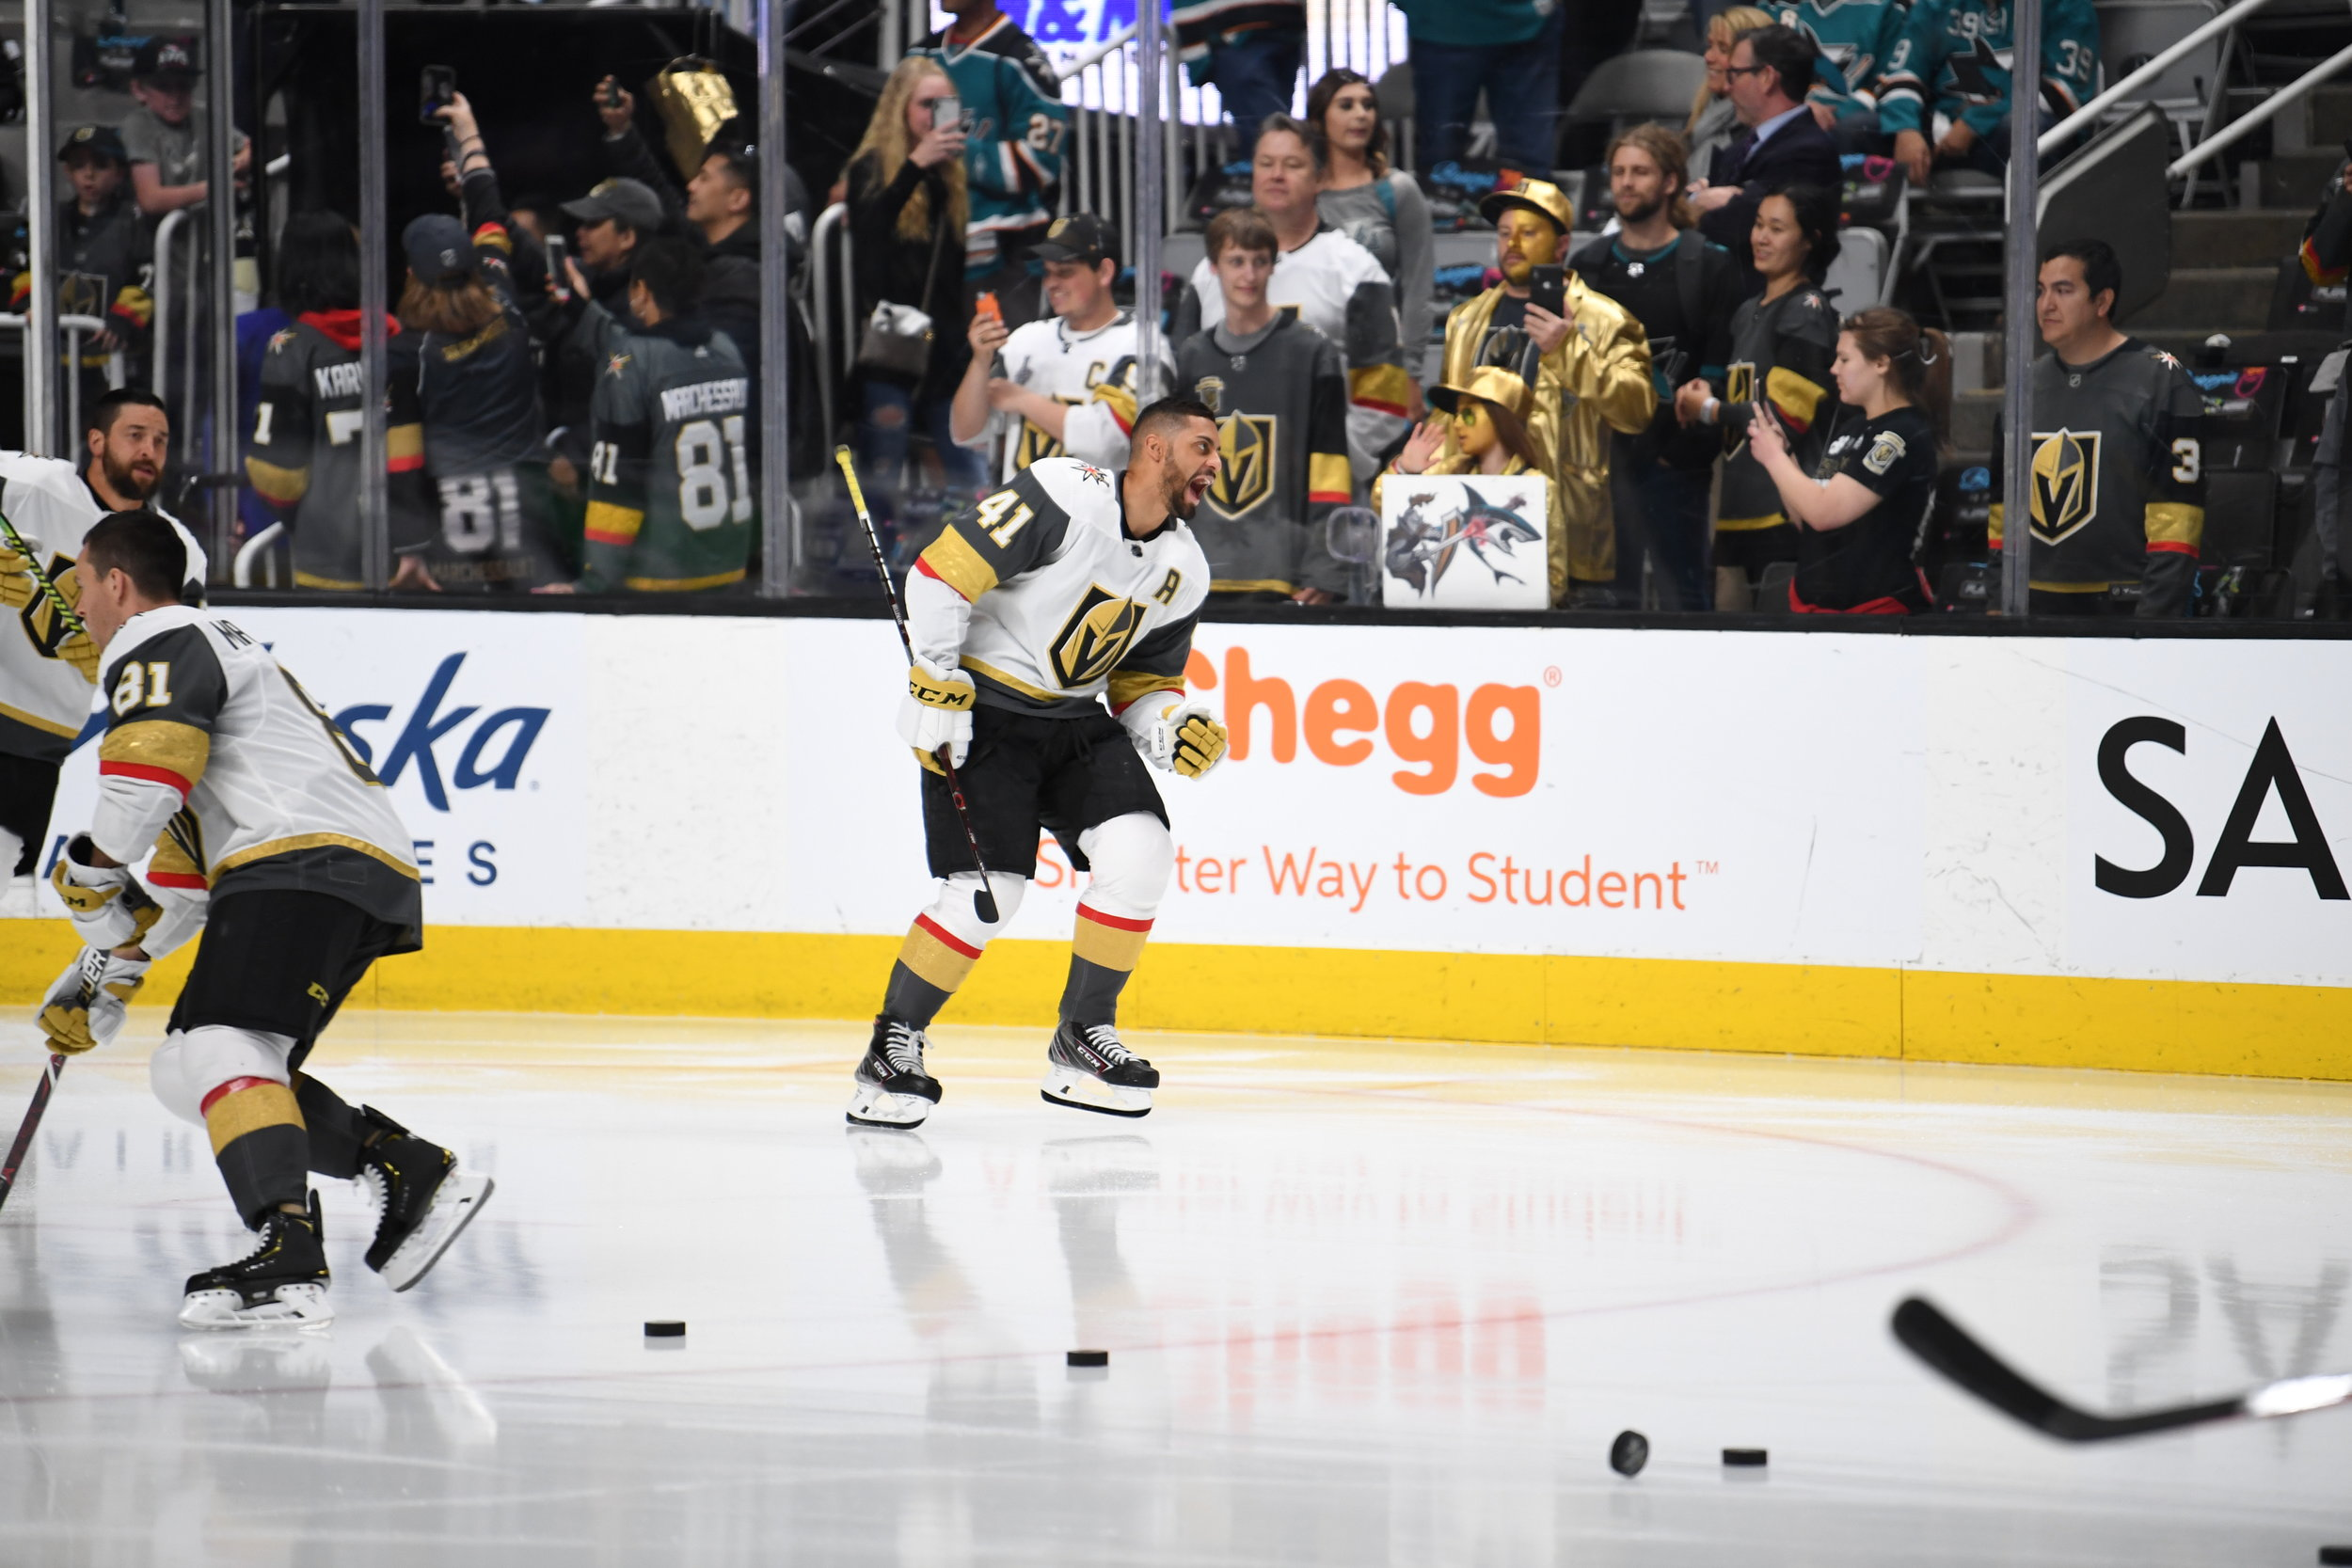 NHL_2019-04-12_0050.JPG